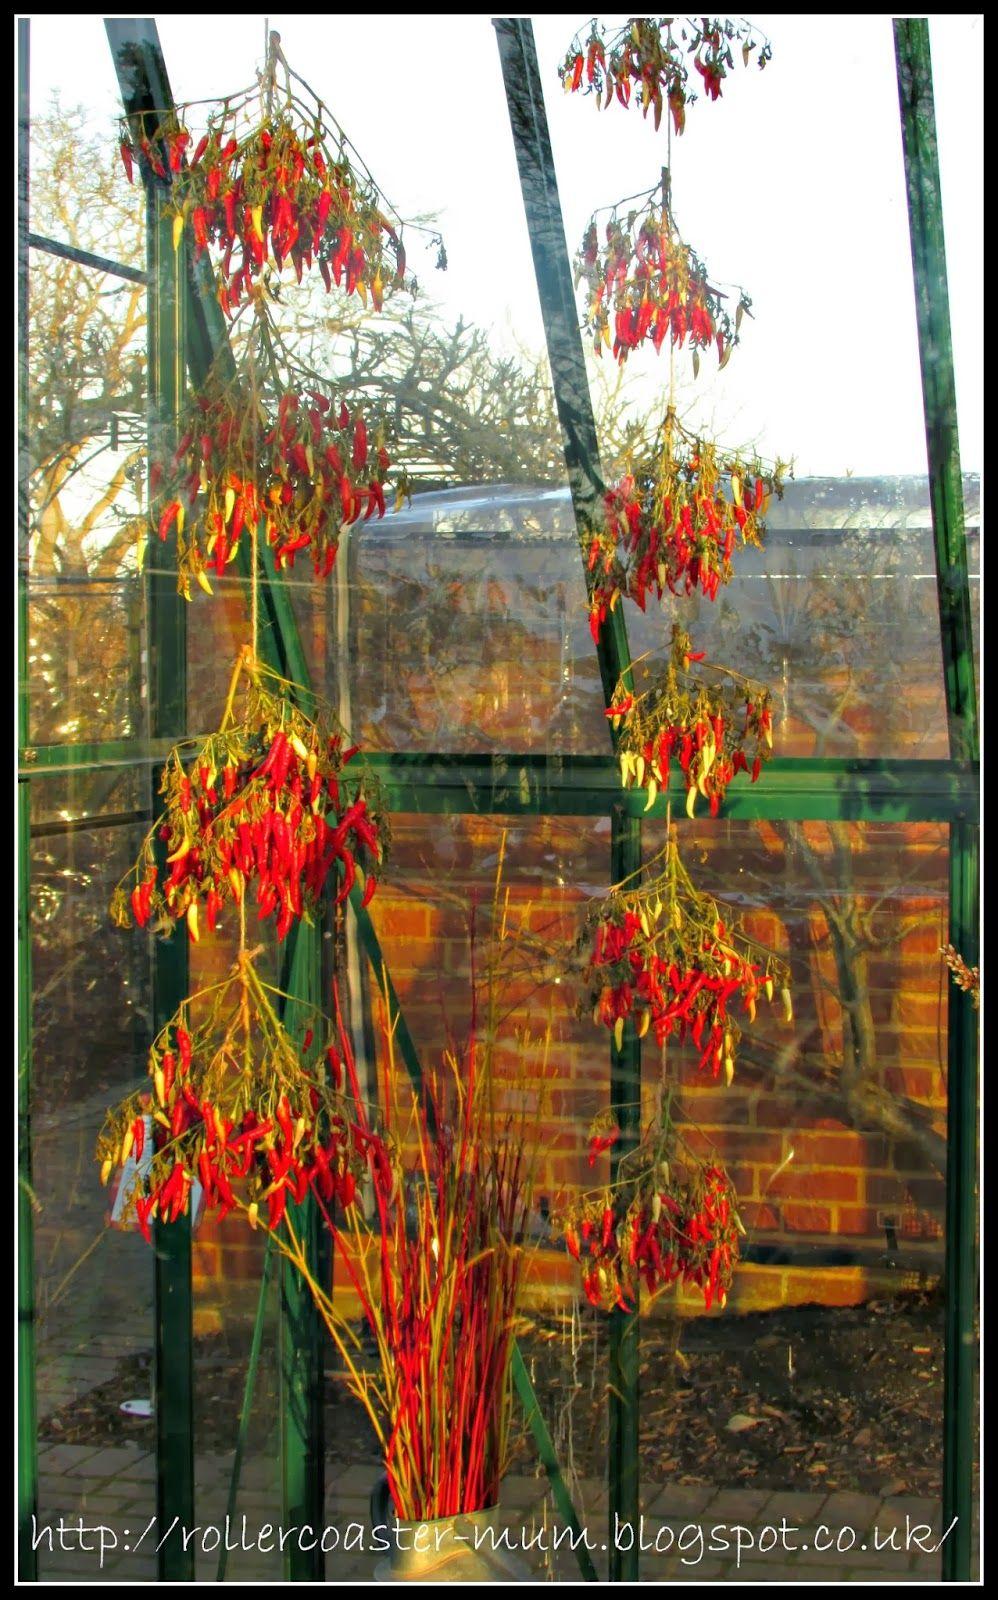 greenhouse Fruit Demo Garden RHS Wisley - drying chillies ...